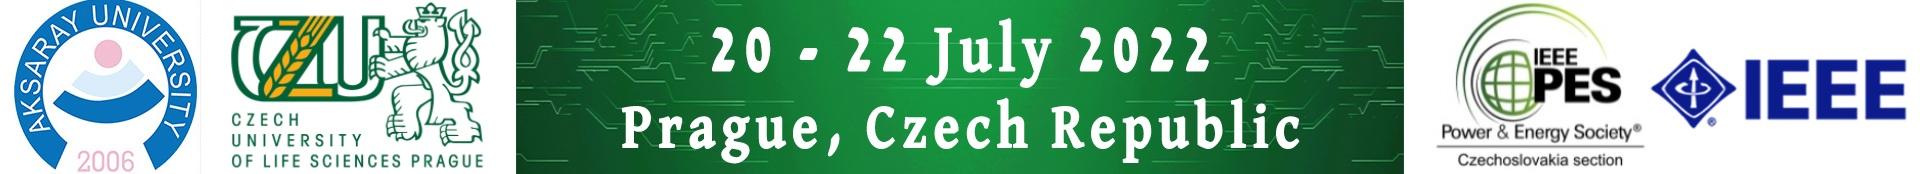 Conferance Date